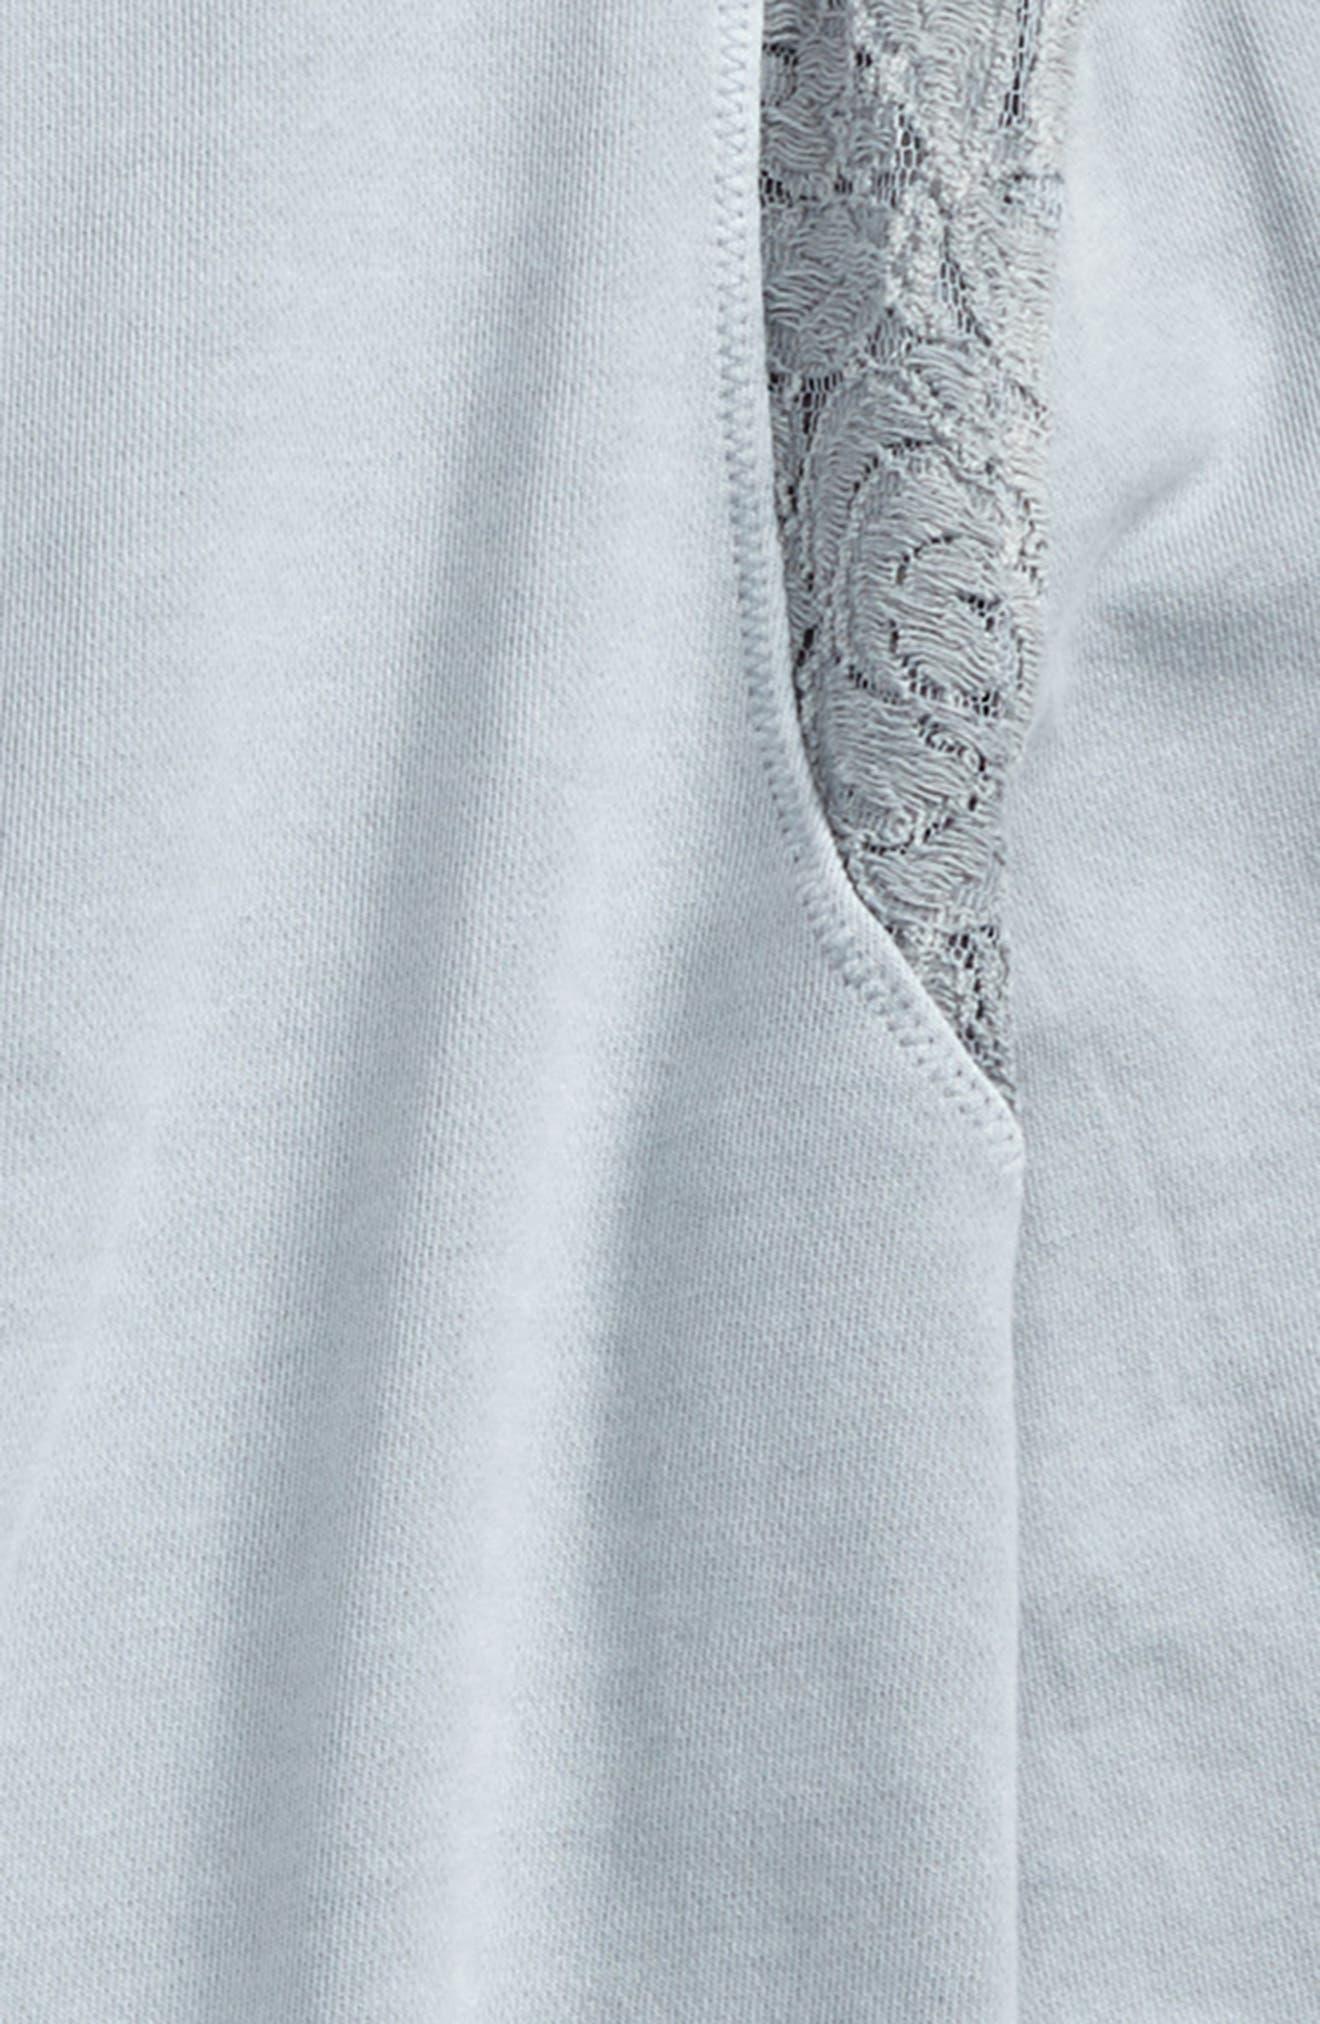 Lace Sweatshirt,                             Alternate thumbnail 2, color,                             Grey Dawn